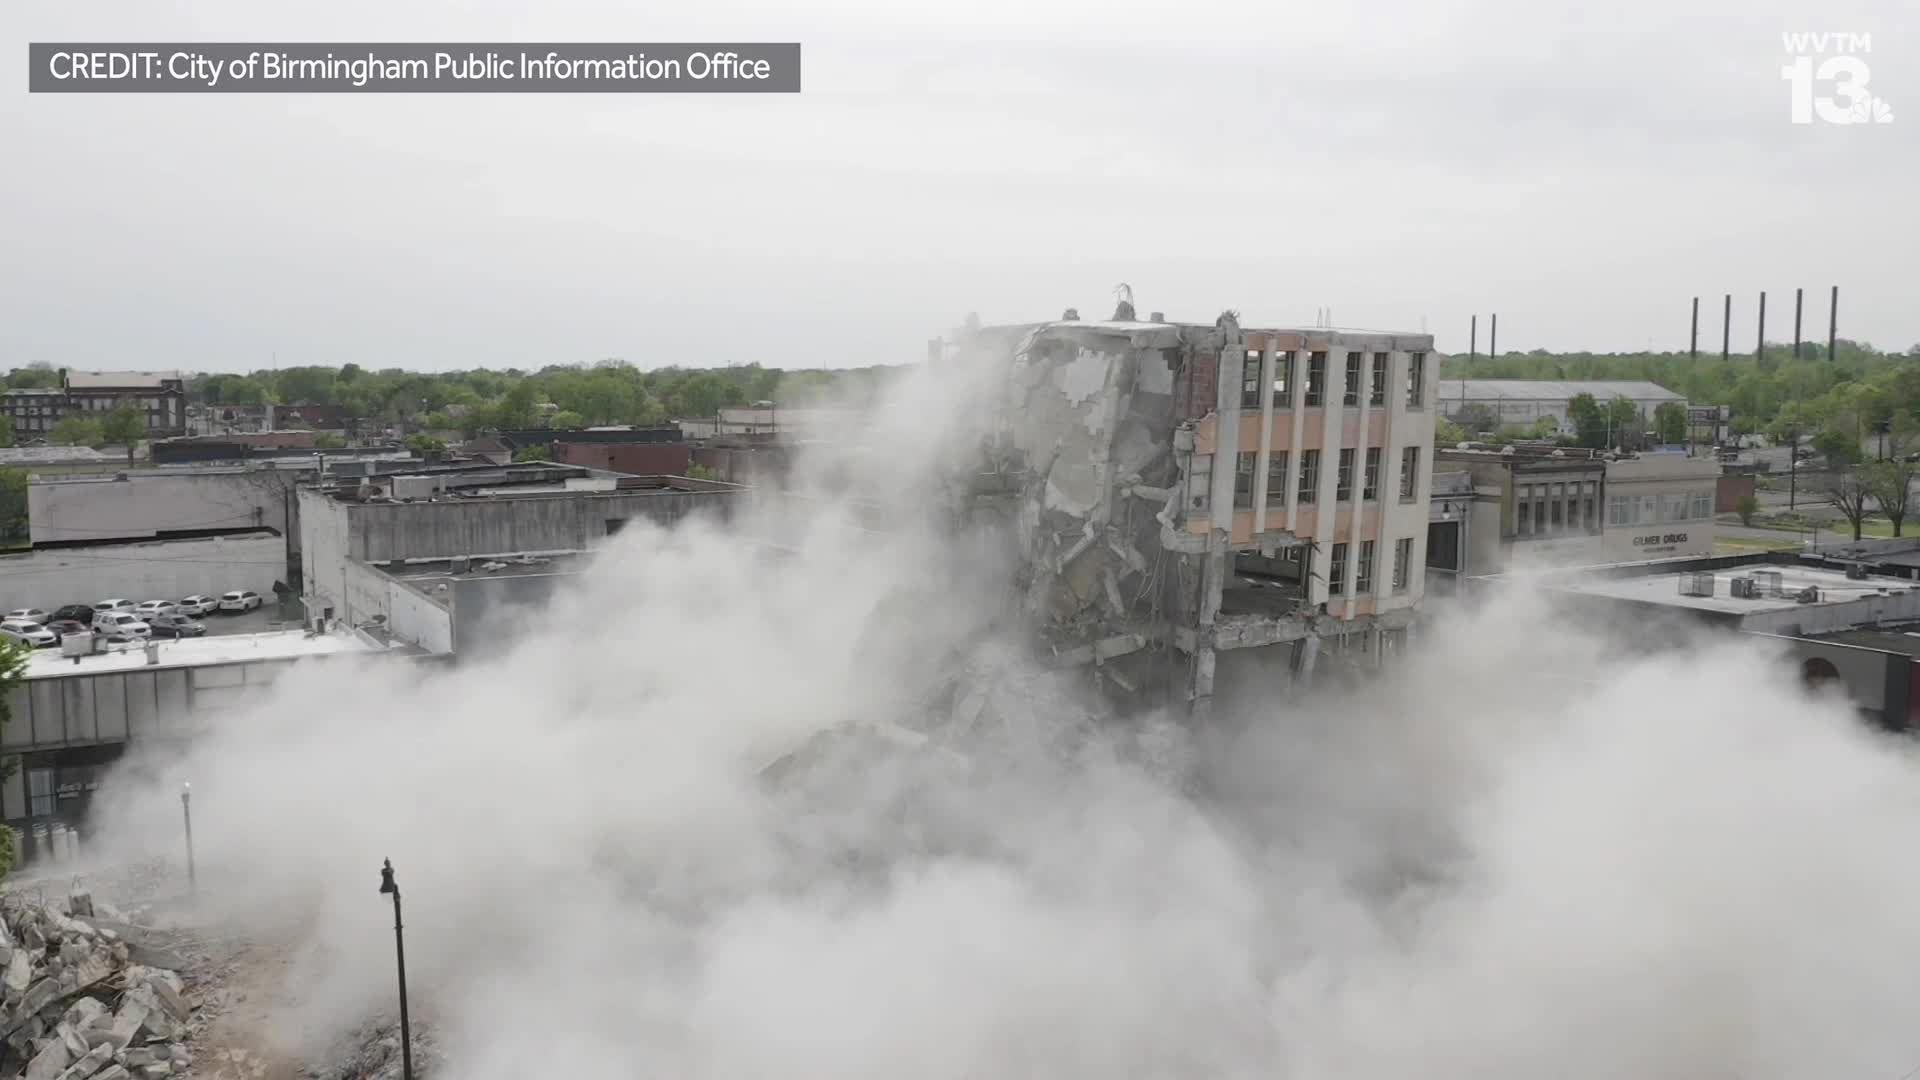 Demolition of the Ramsay McCormack Building in Ensley